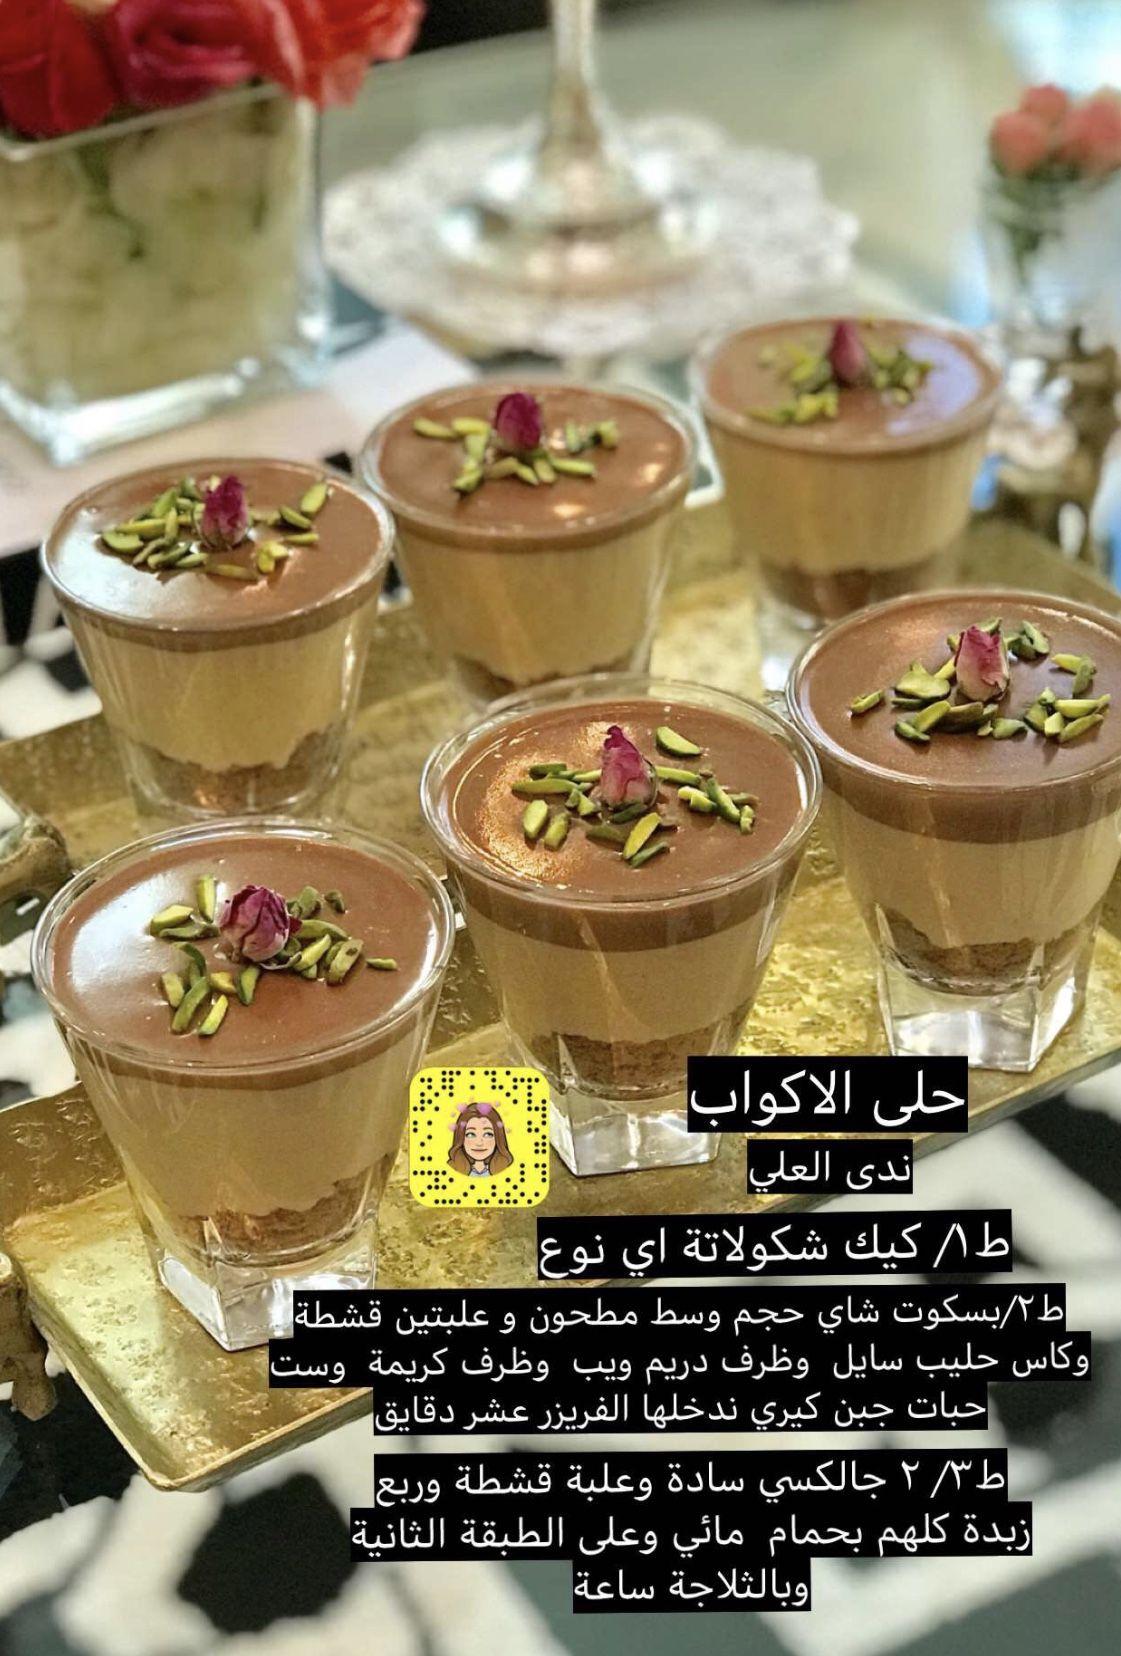 Pin By Hessa On وصفات حلا Yummy Food Dessert Cookout Food Food